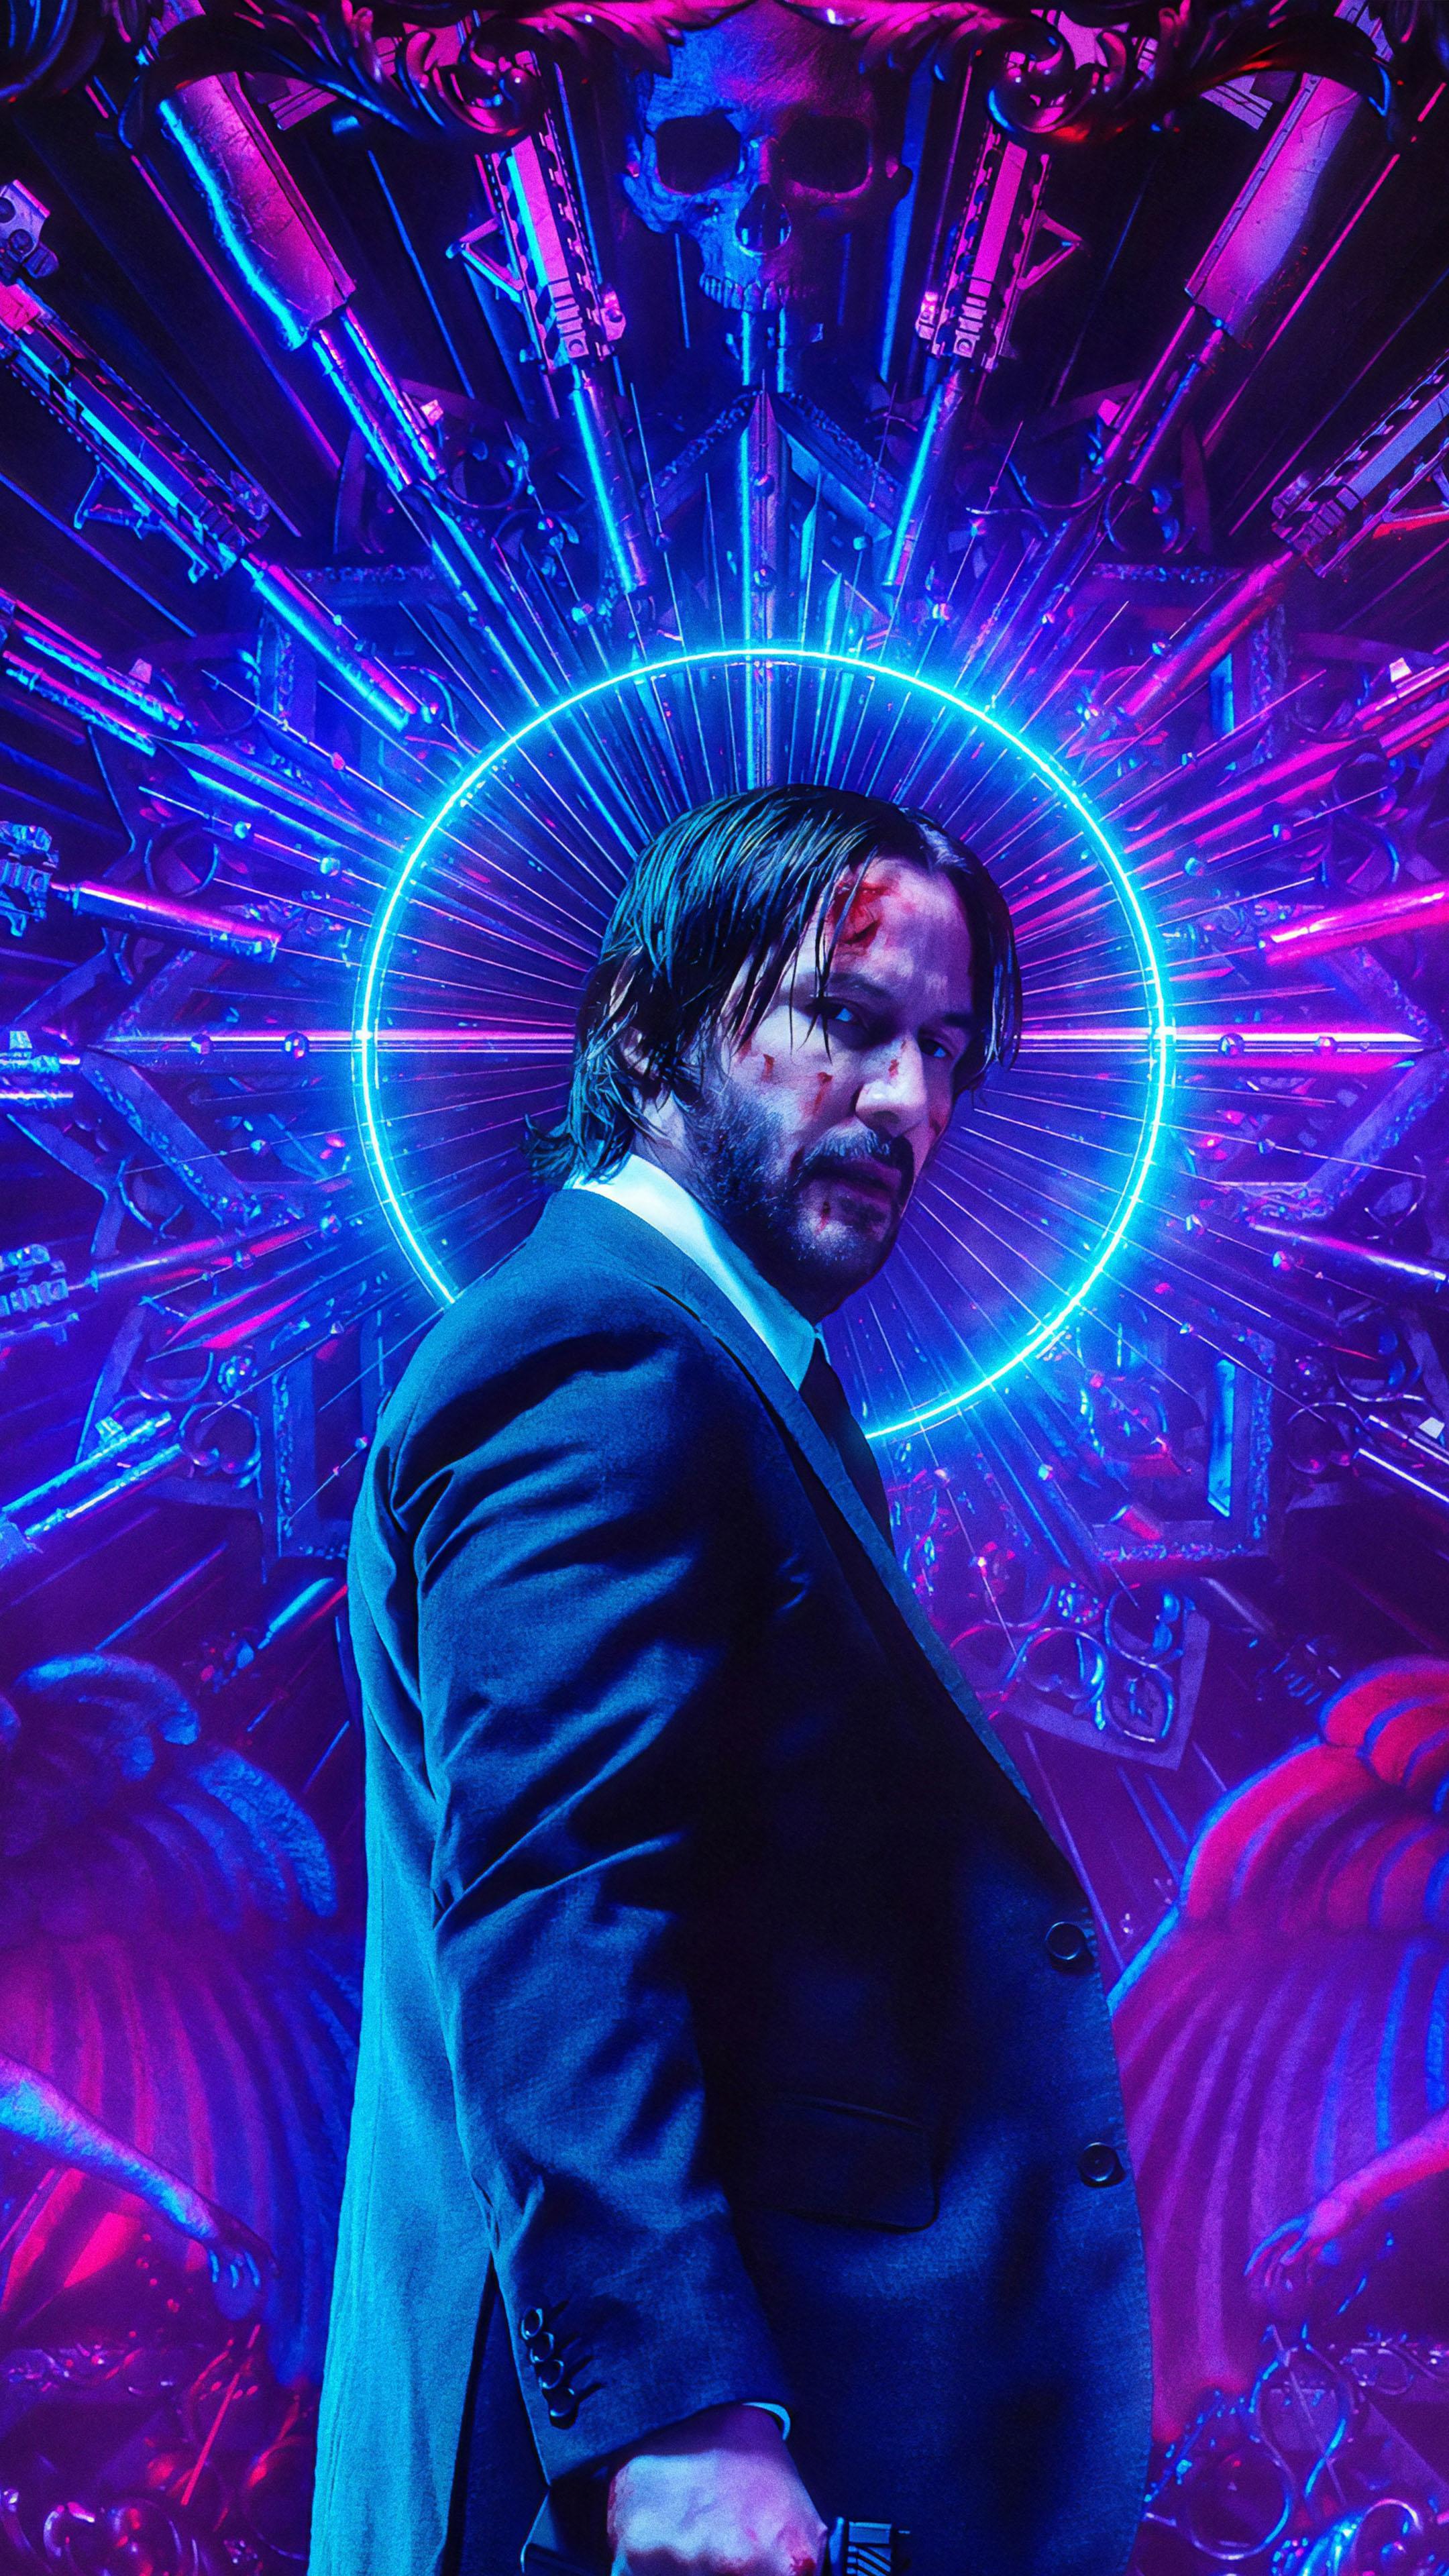 Keanu Reeves Neon John Wick Chapter 3 Parabellum 4k Ultra Hd Mobile Wallpaper